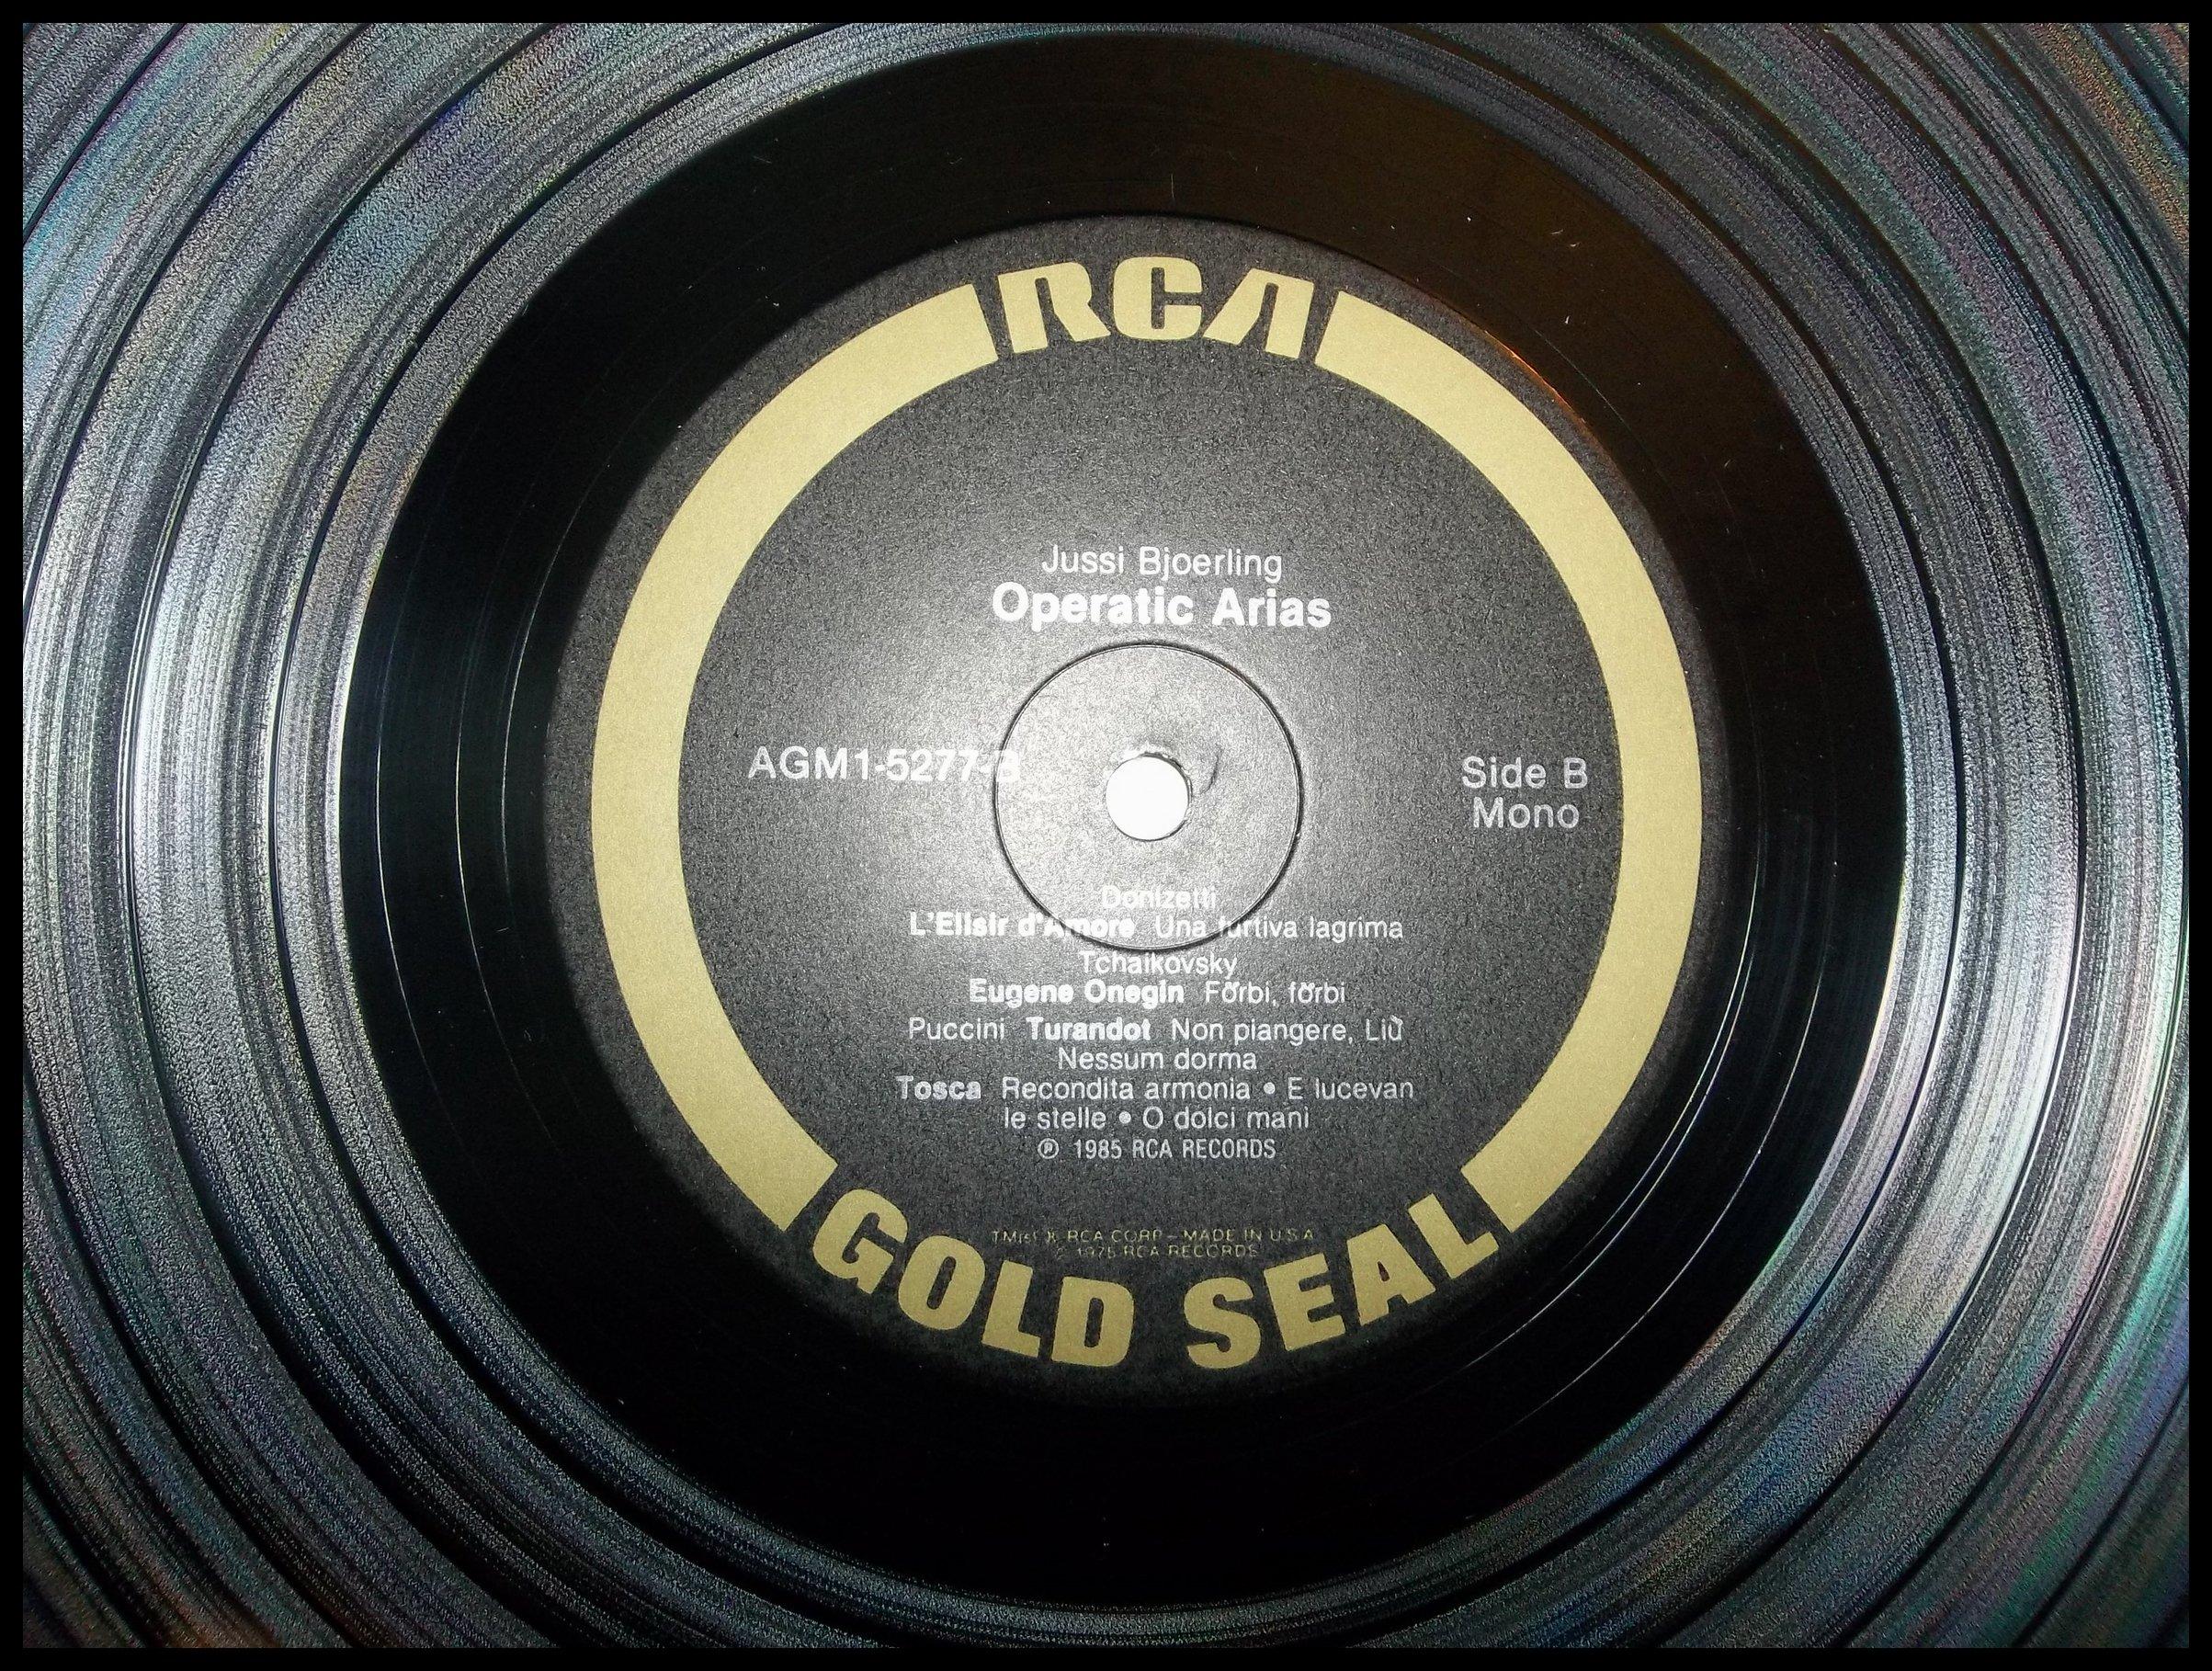 OPERATIC ARIAS-BJOERLING [Vinyl] by RCA (Image #3)